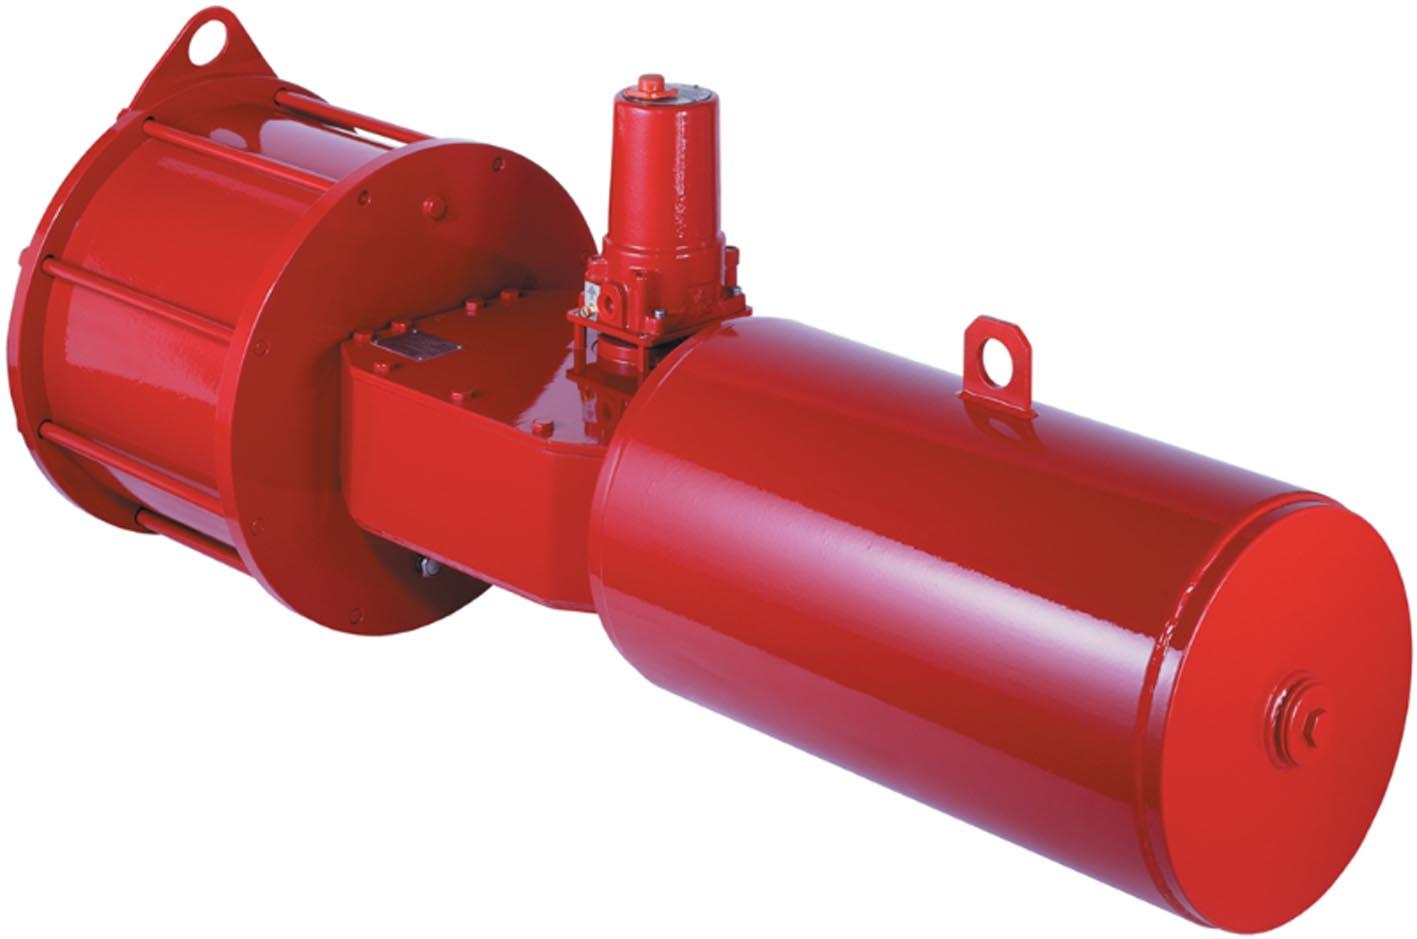 Original Image: Rotork Fluid Systems GP